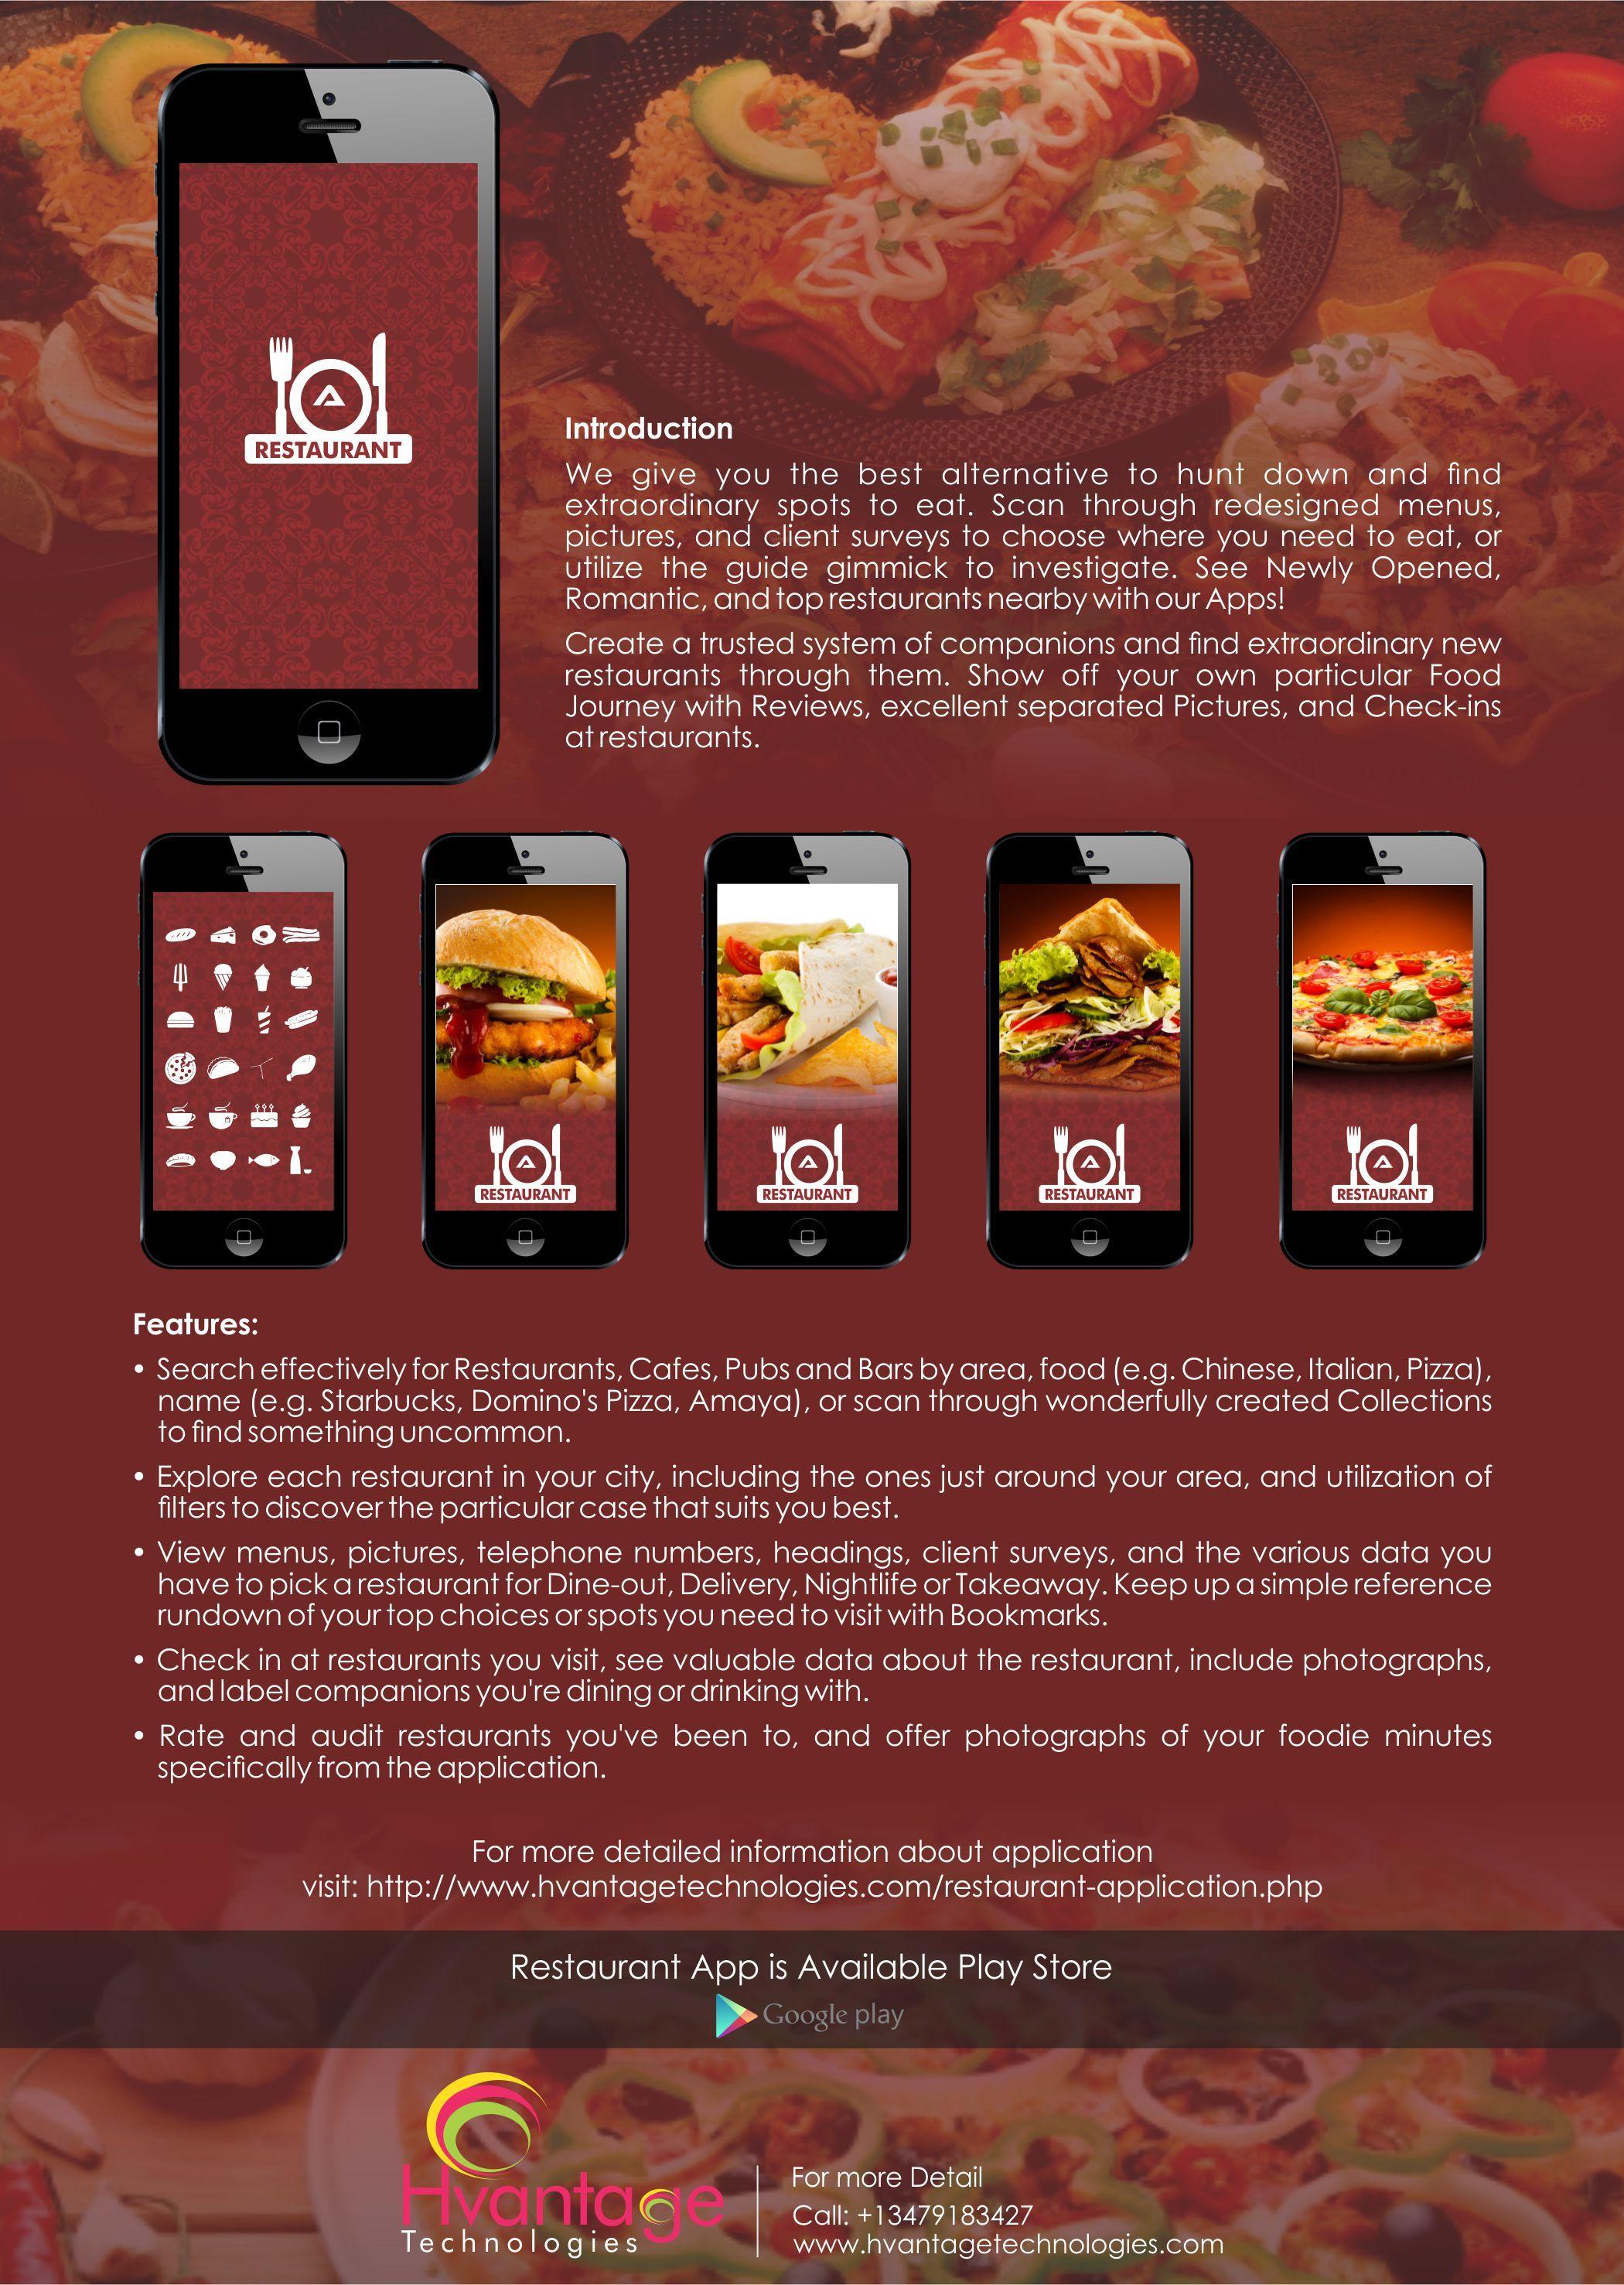 Hvantage's RestaurantApp builder allows you to create